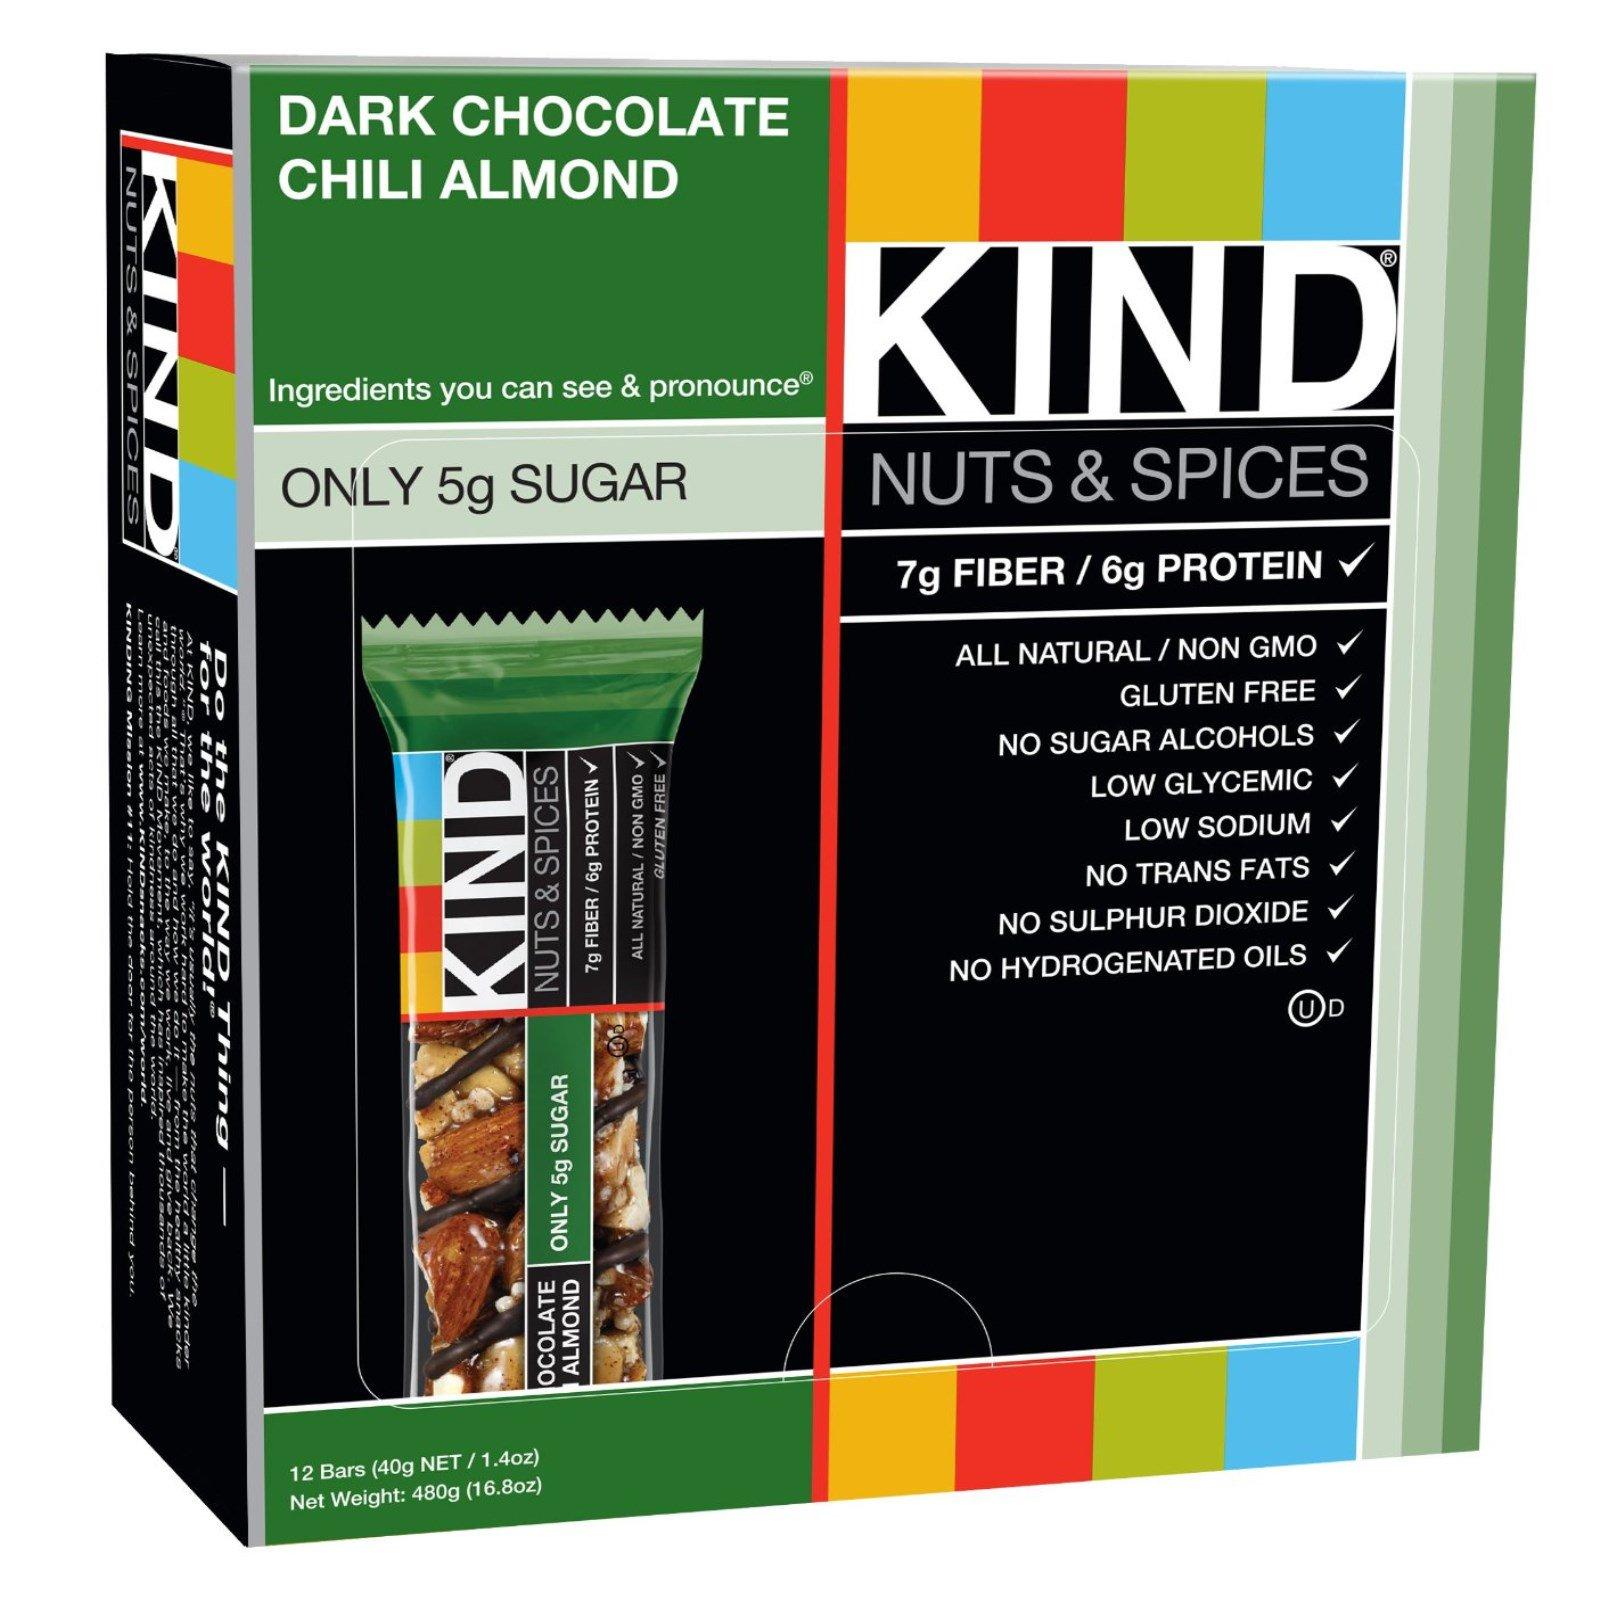 KIND Bars, Nuts & Spices, Dark Chocolate Chili Almond, 12 Bars